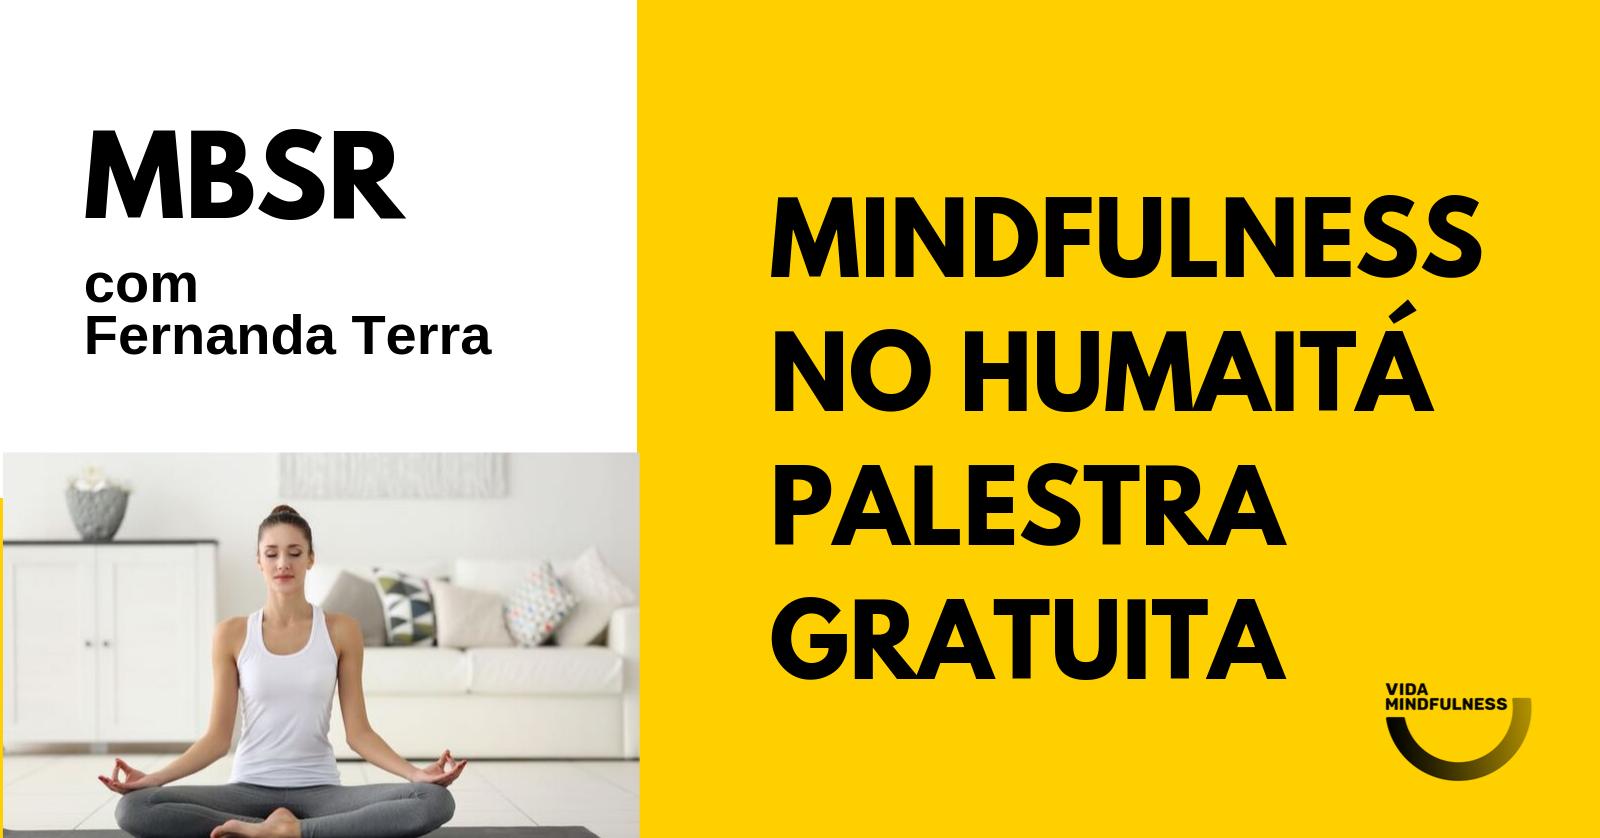 Palestra Gratuita De Mindfulness No Humaitá Sympla